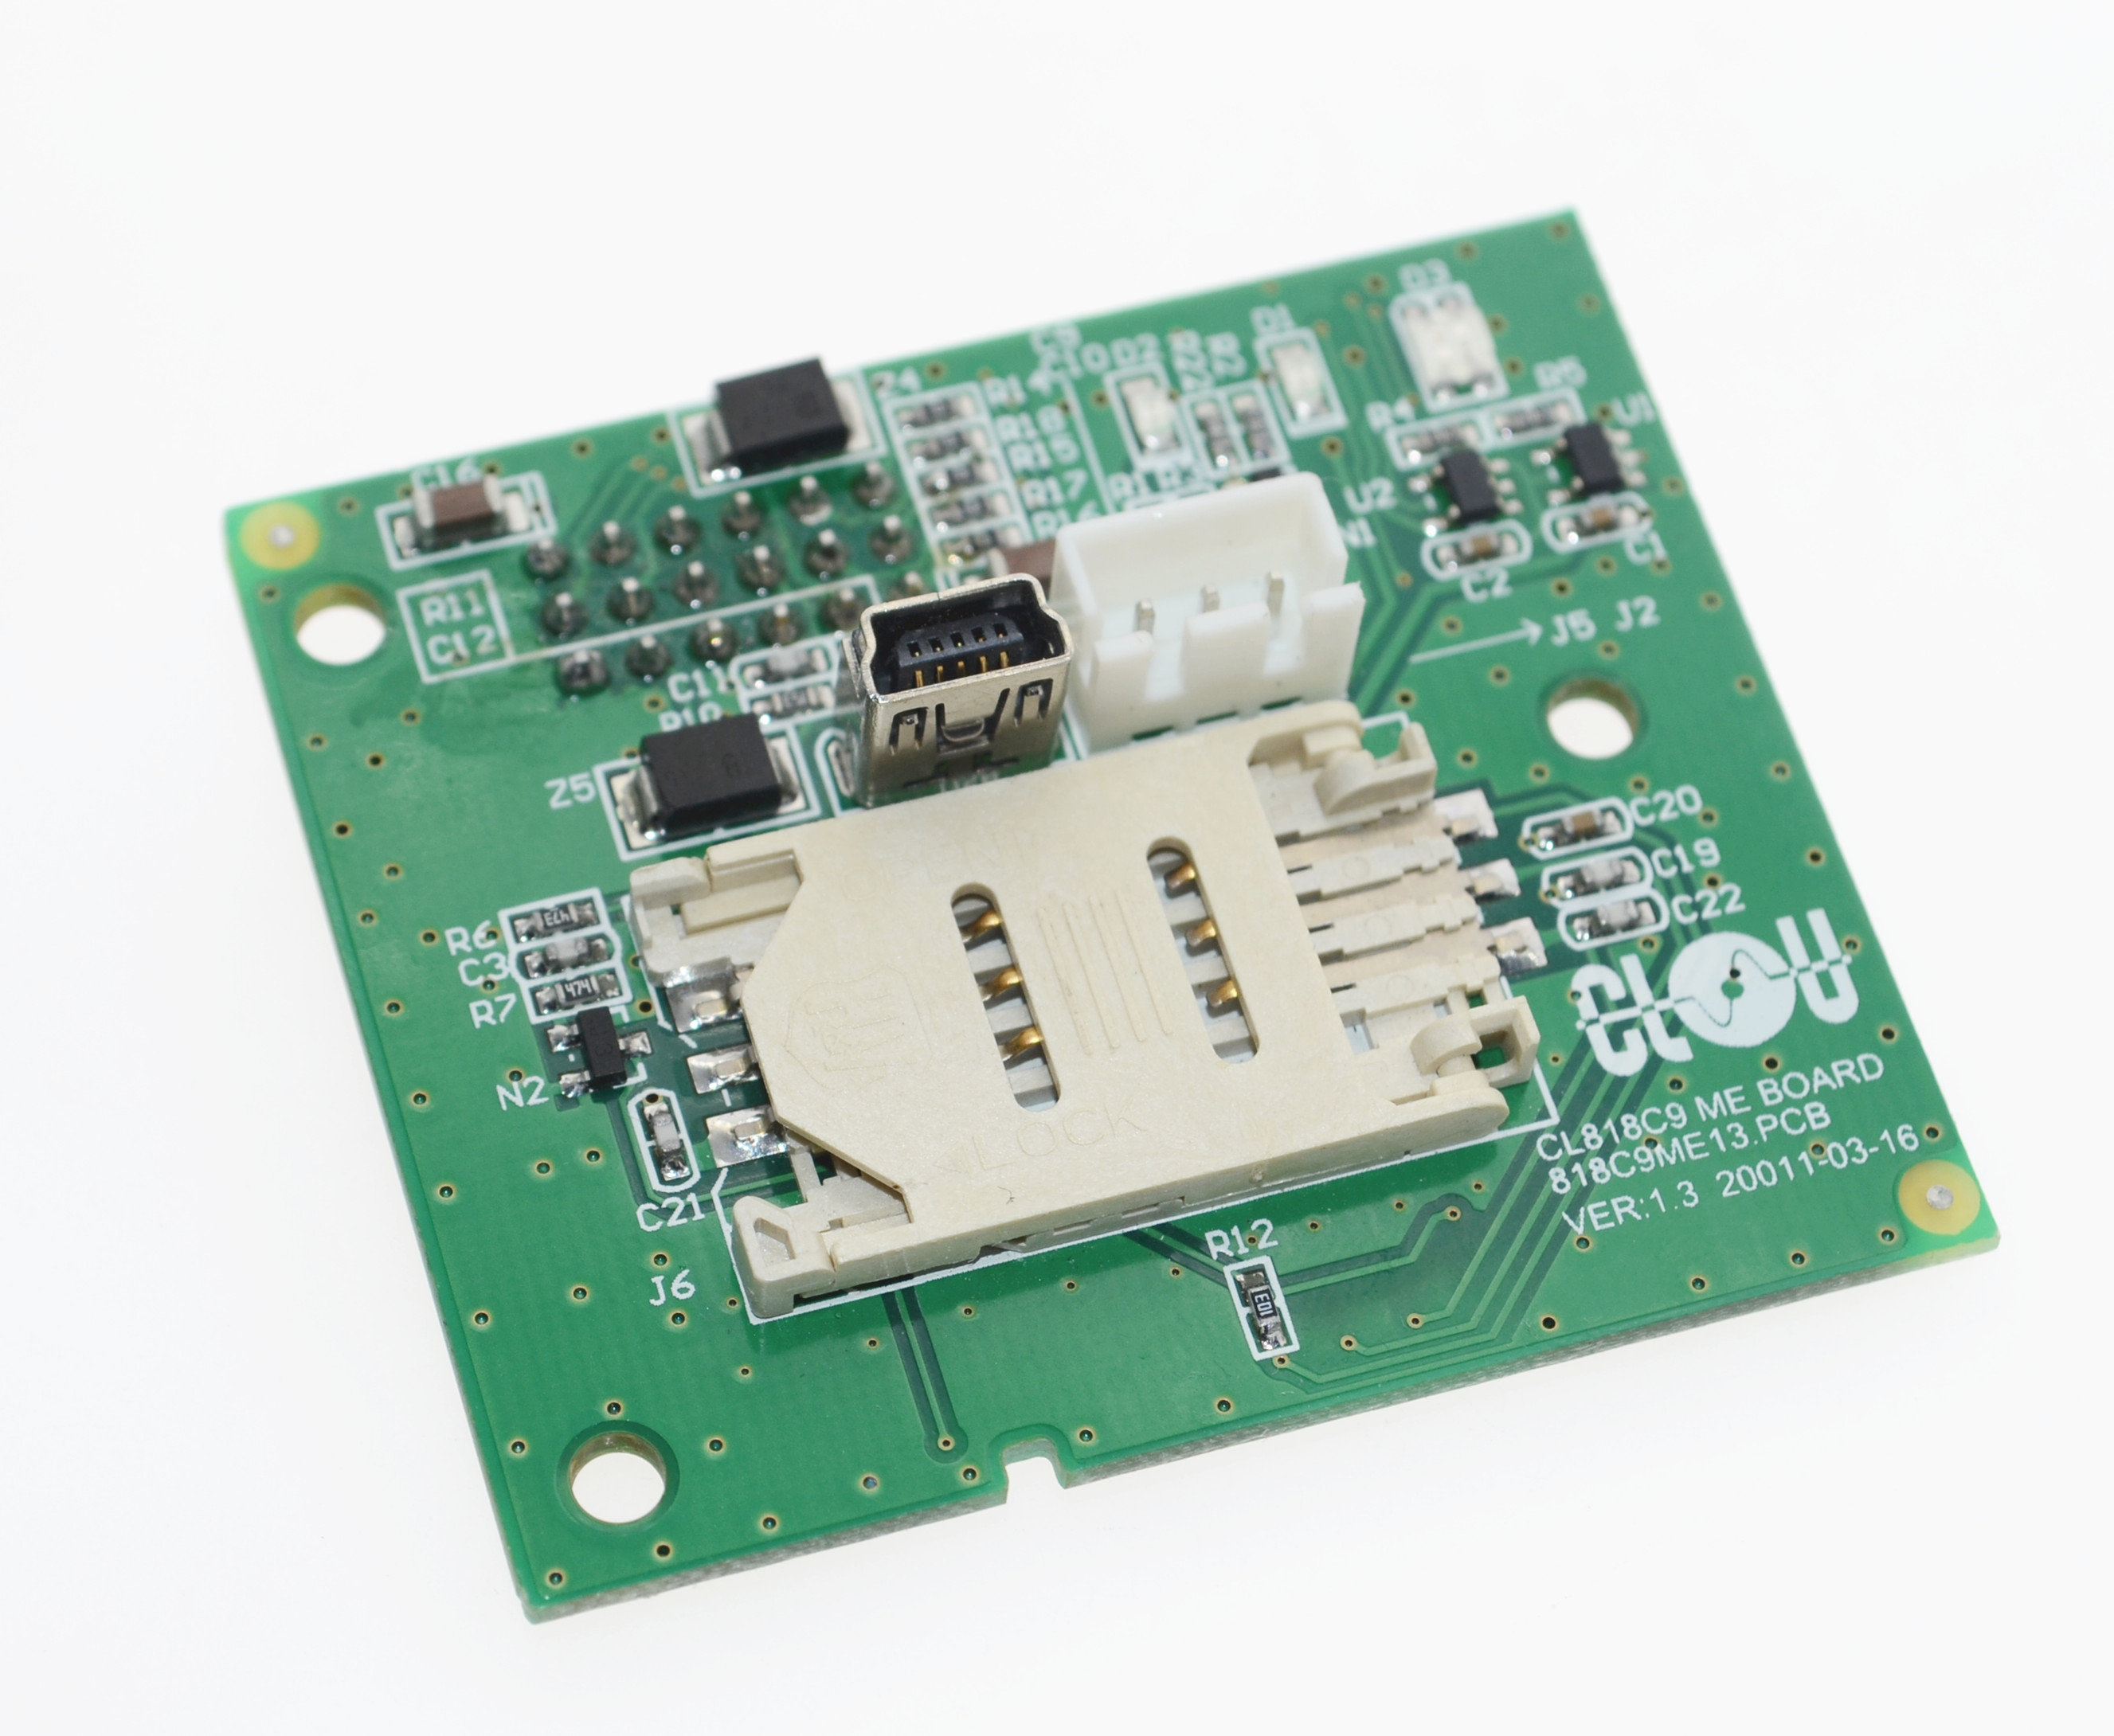 GPRS SIM900 GSM SMS GPRS Communication Flip Card Slot Replace SIM900 Through Neoway M590 For Arduino